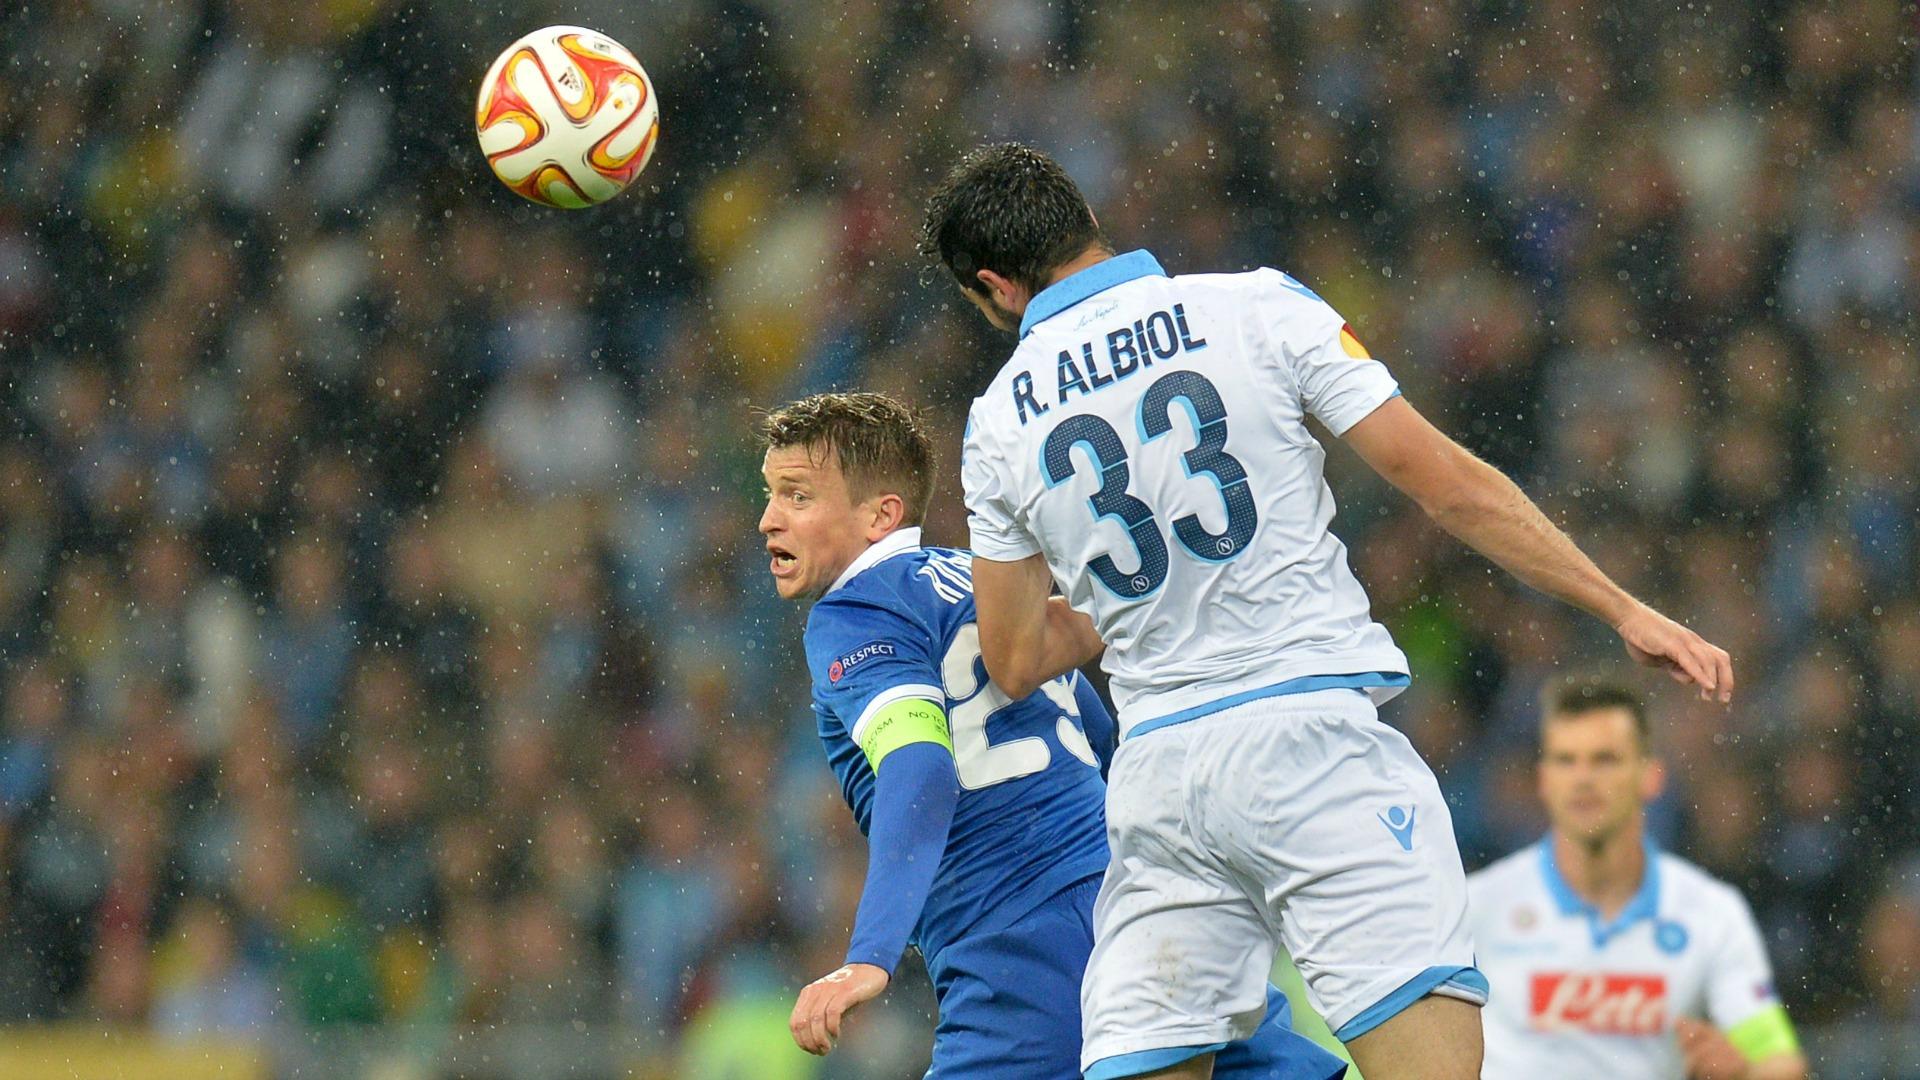 Raul Albiol Dnipro Napoli Europa League